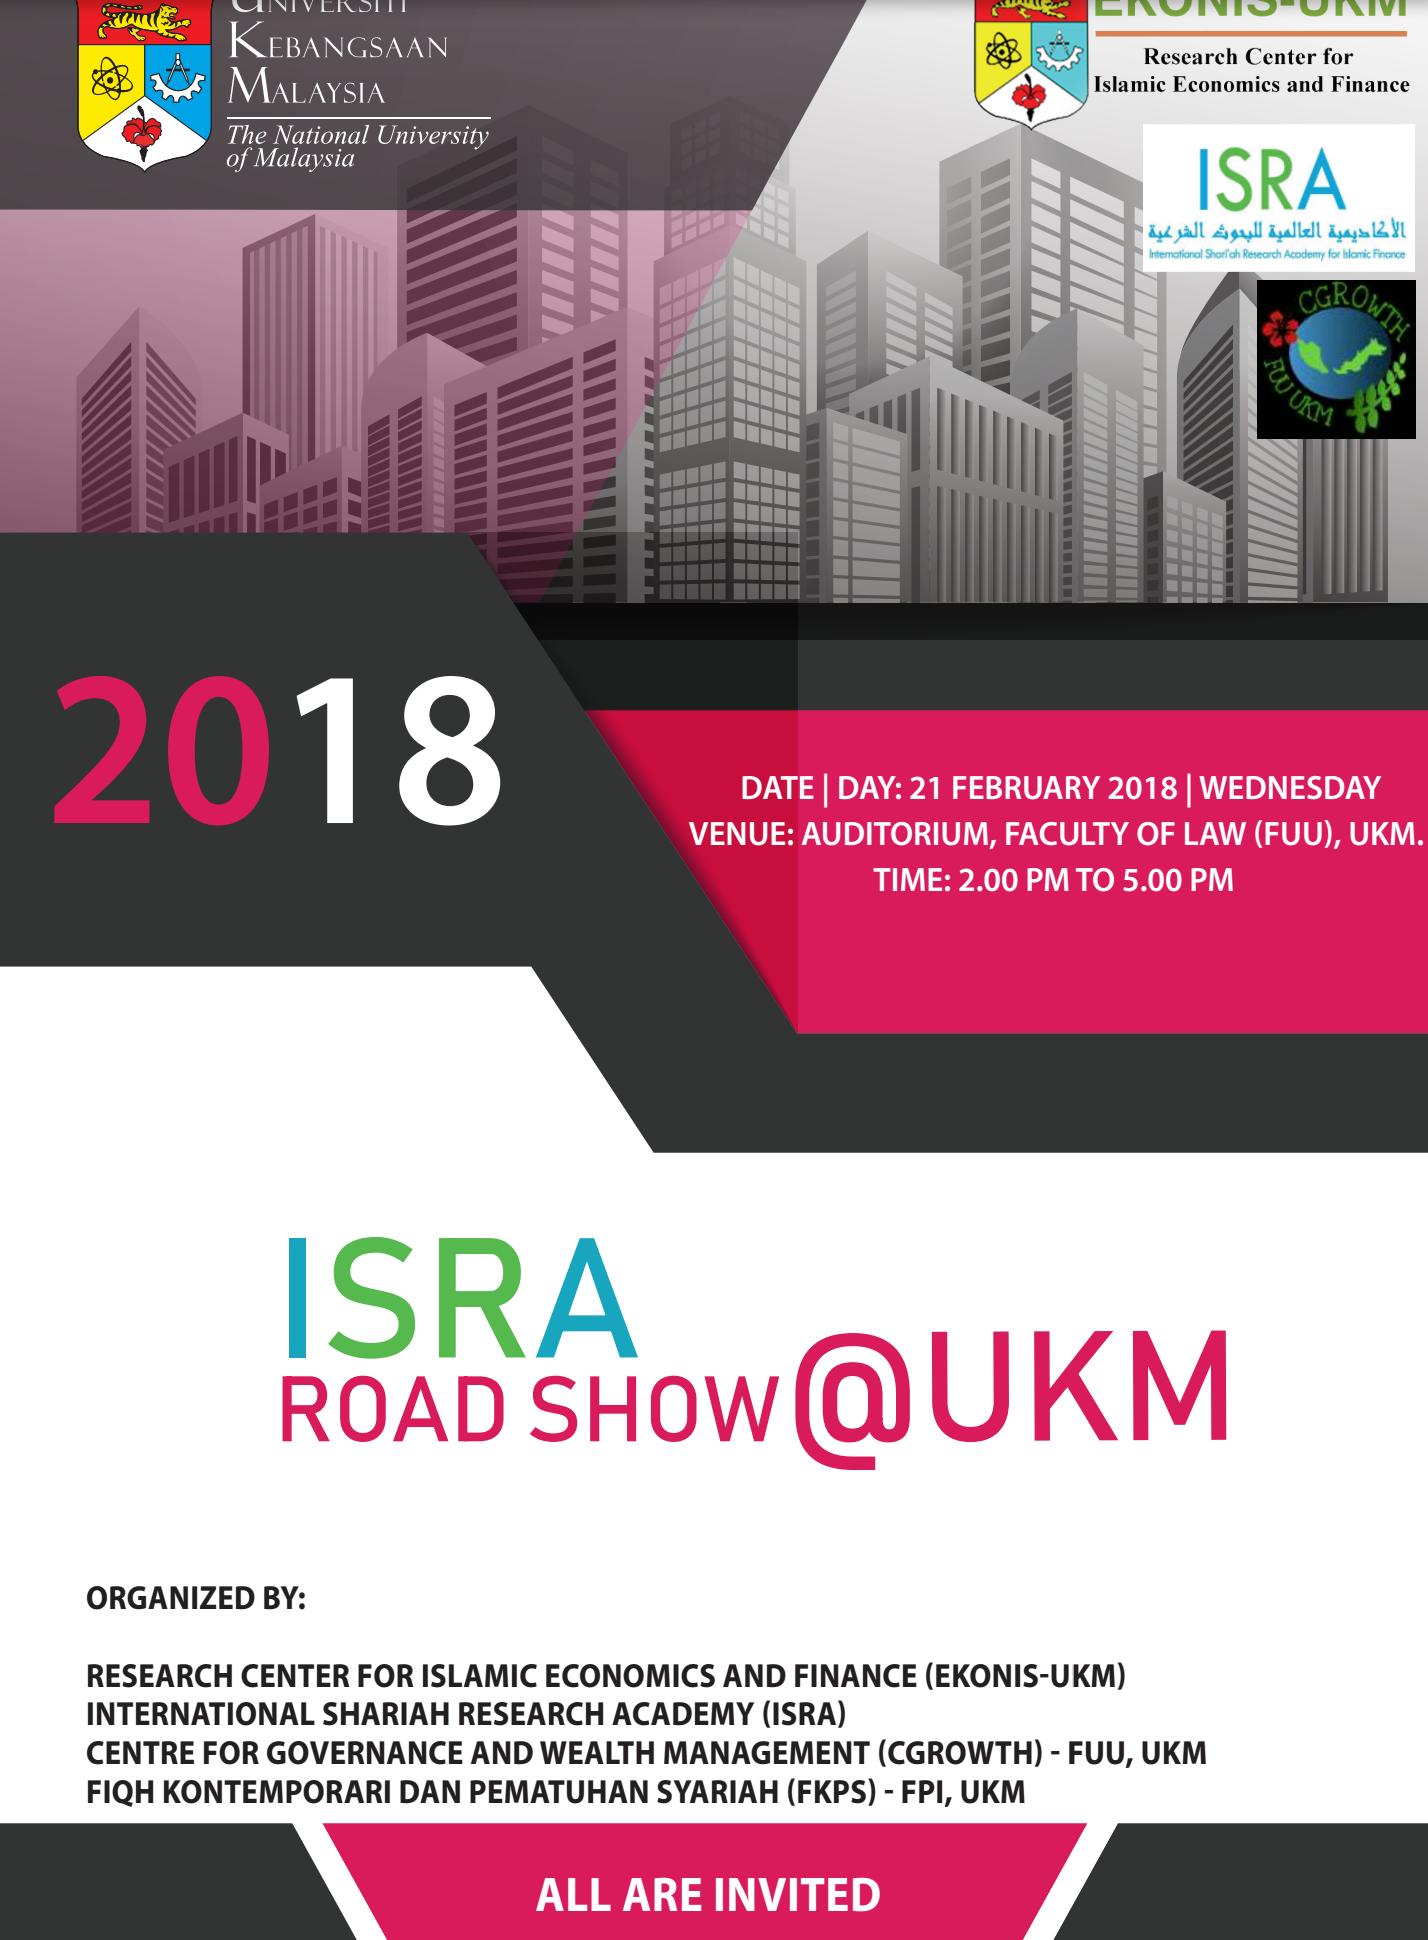 ISRA Road Show @UKM